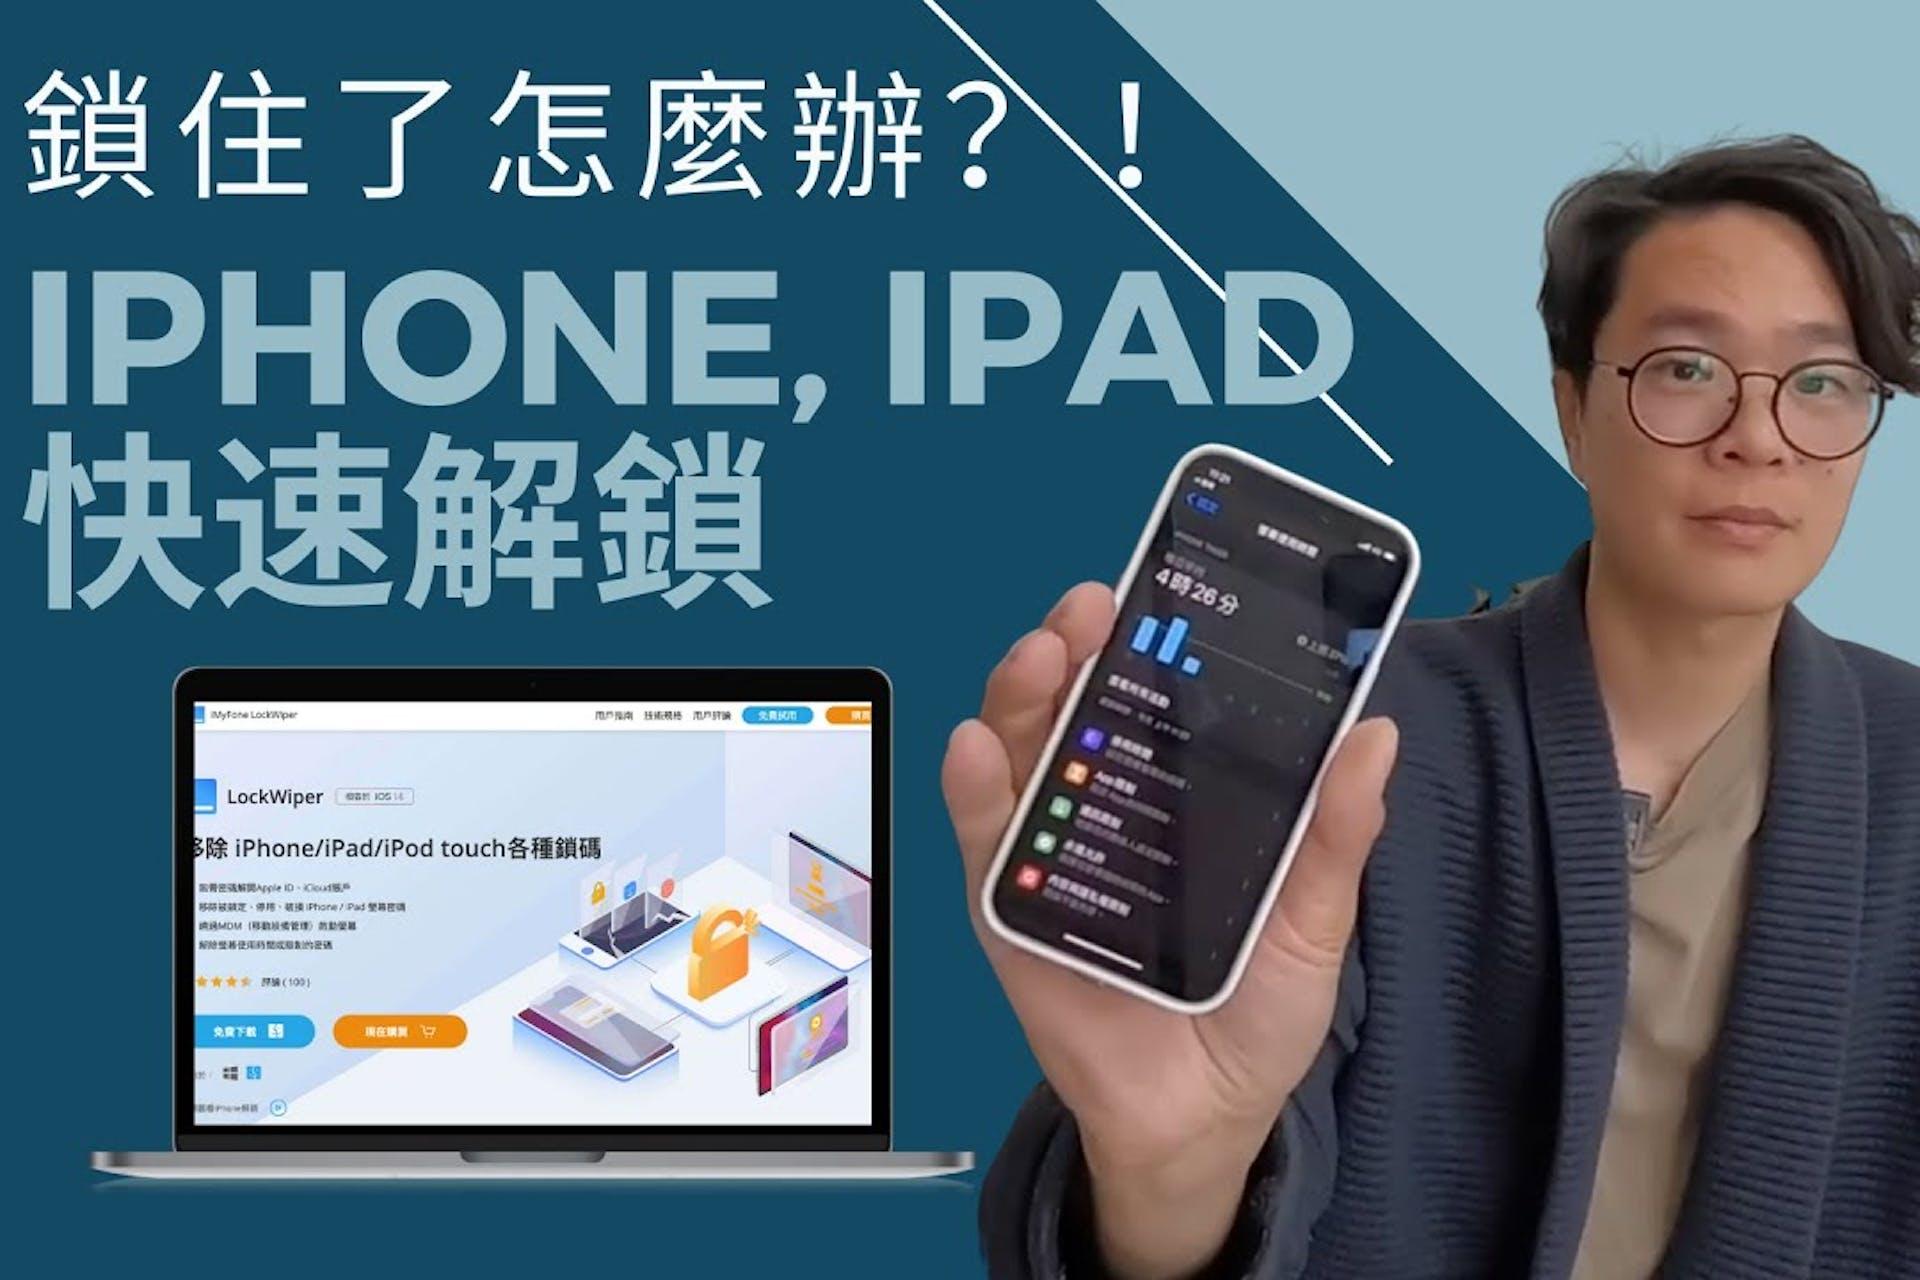 iPhone、iPad、Apple ID 鎖住了怎麼辦?這樣做就能快速解鎖